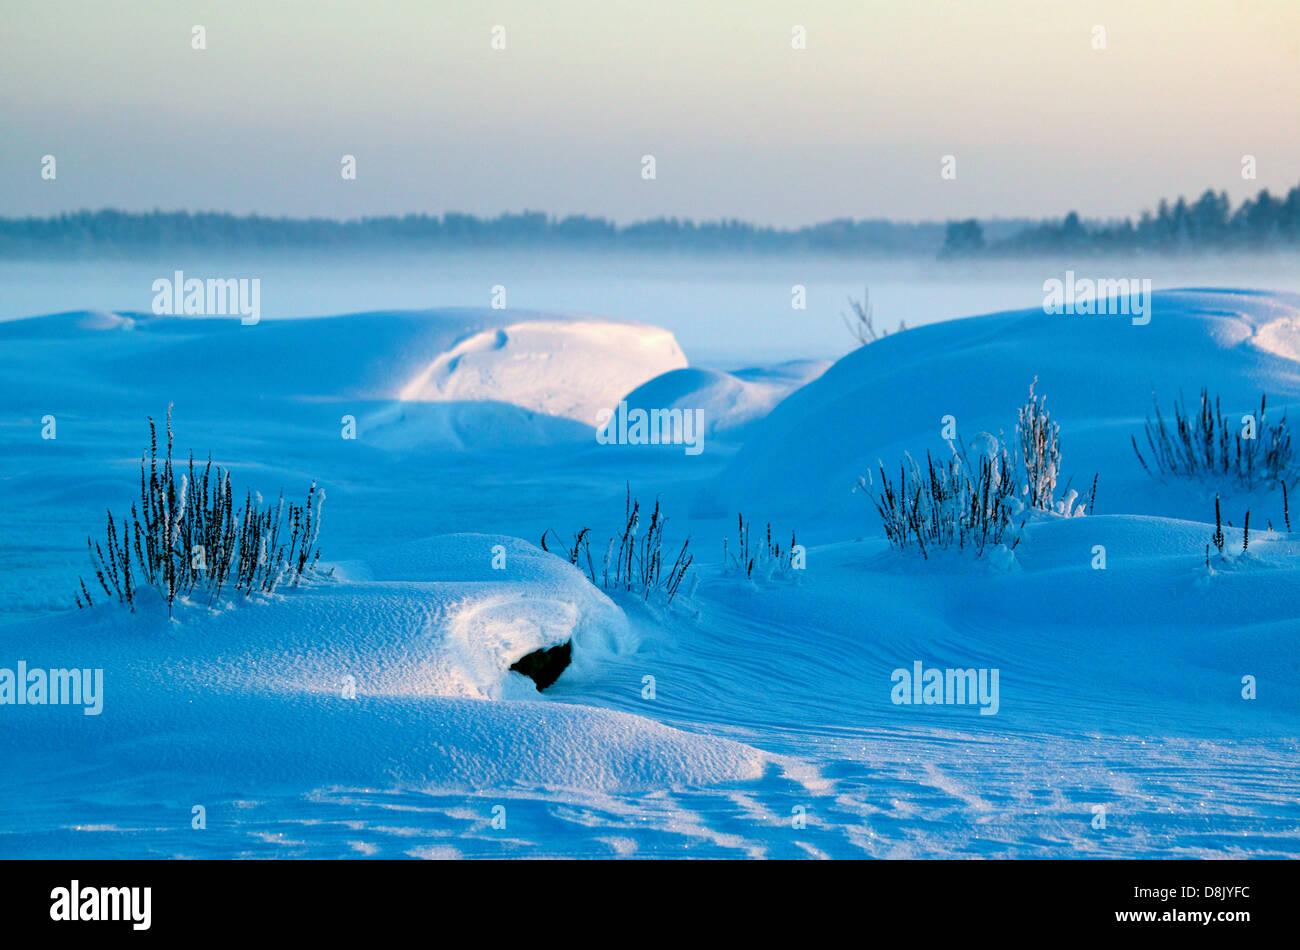 Schönen winter Abend an Moskjaera im See Vansjø, råde Kommune, Østfold fylke, Norwegen. Stockbild